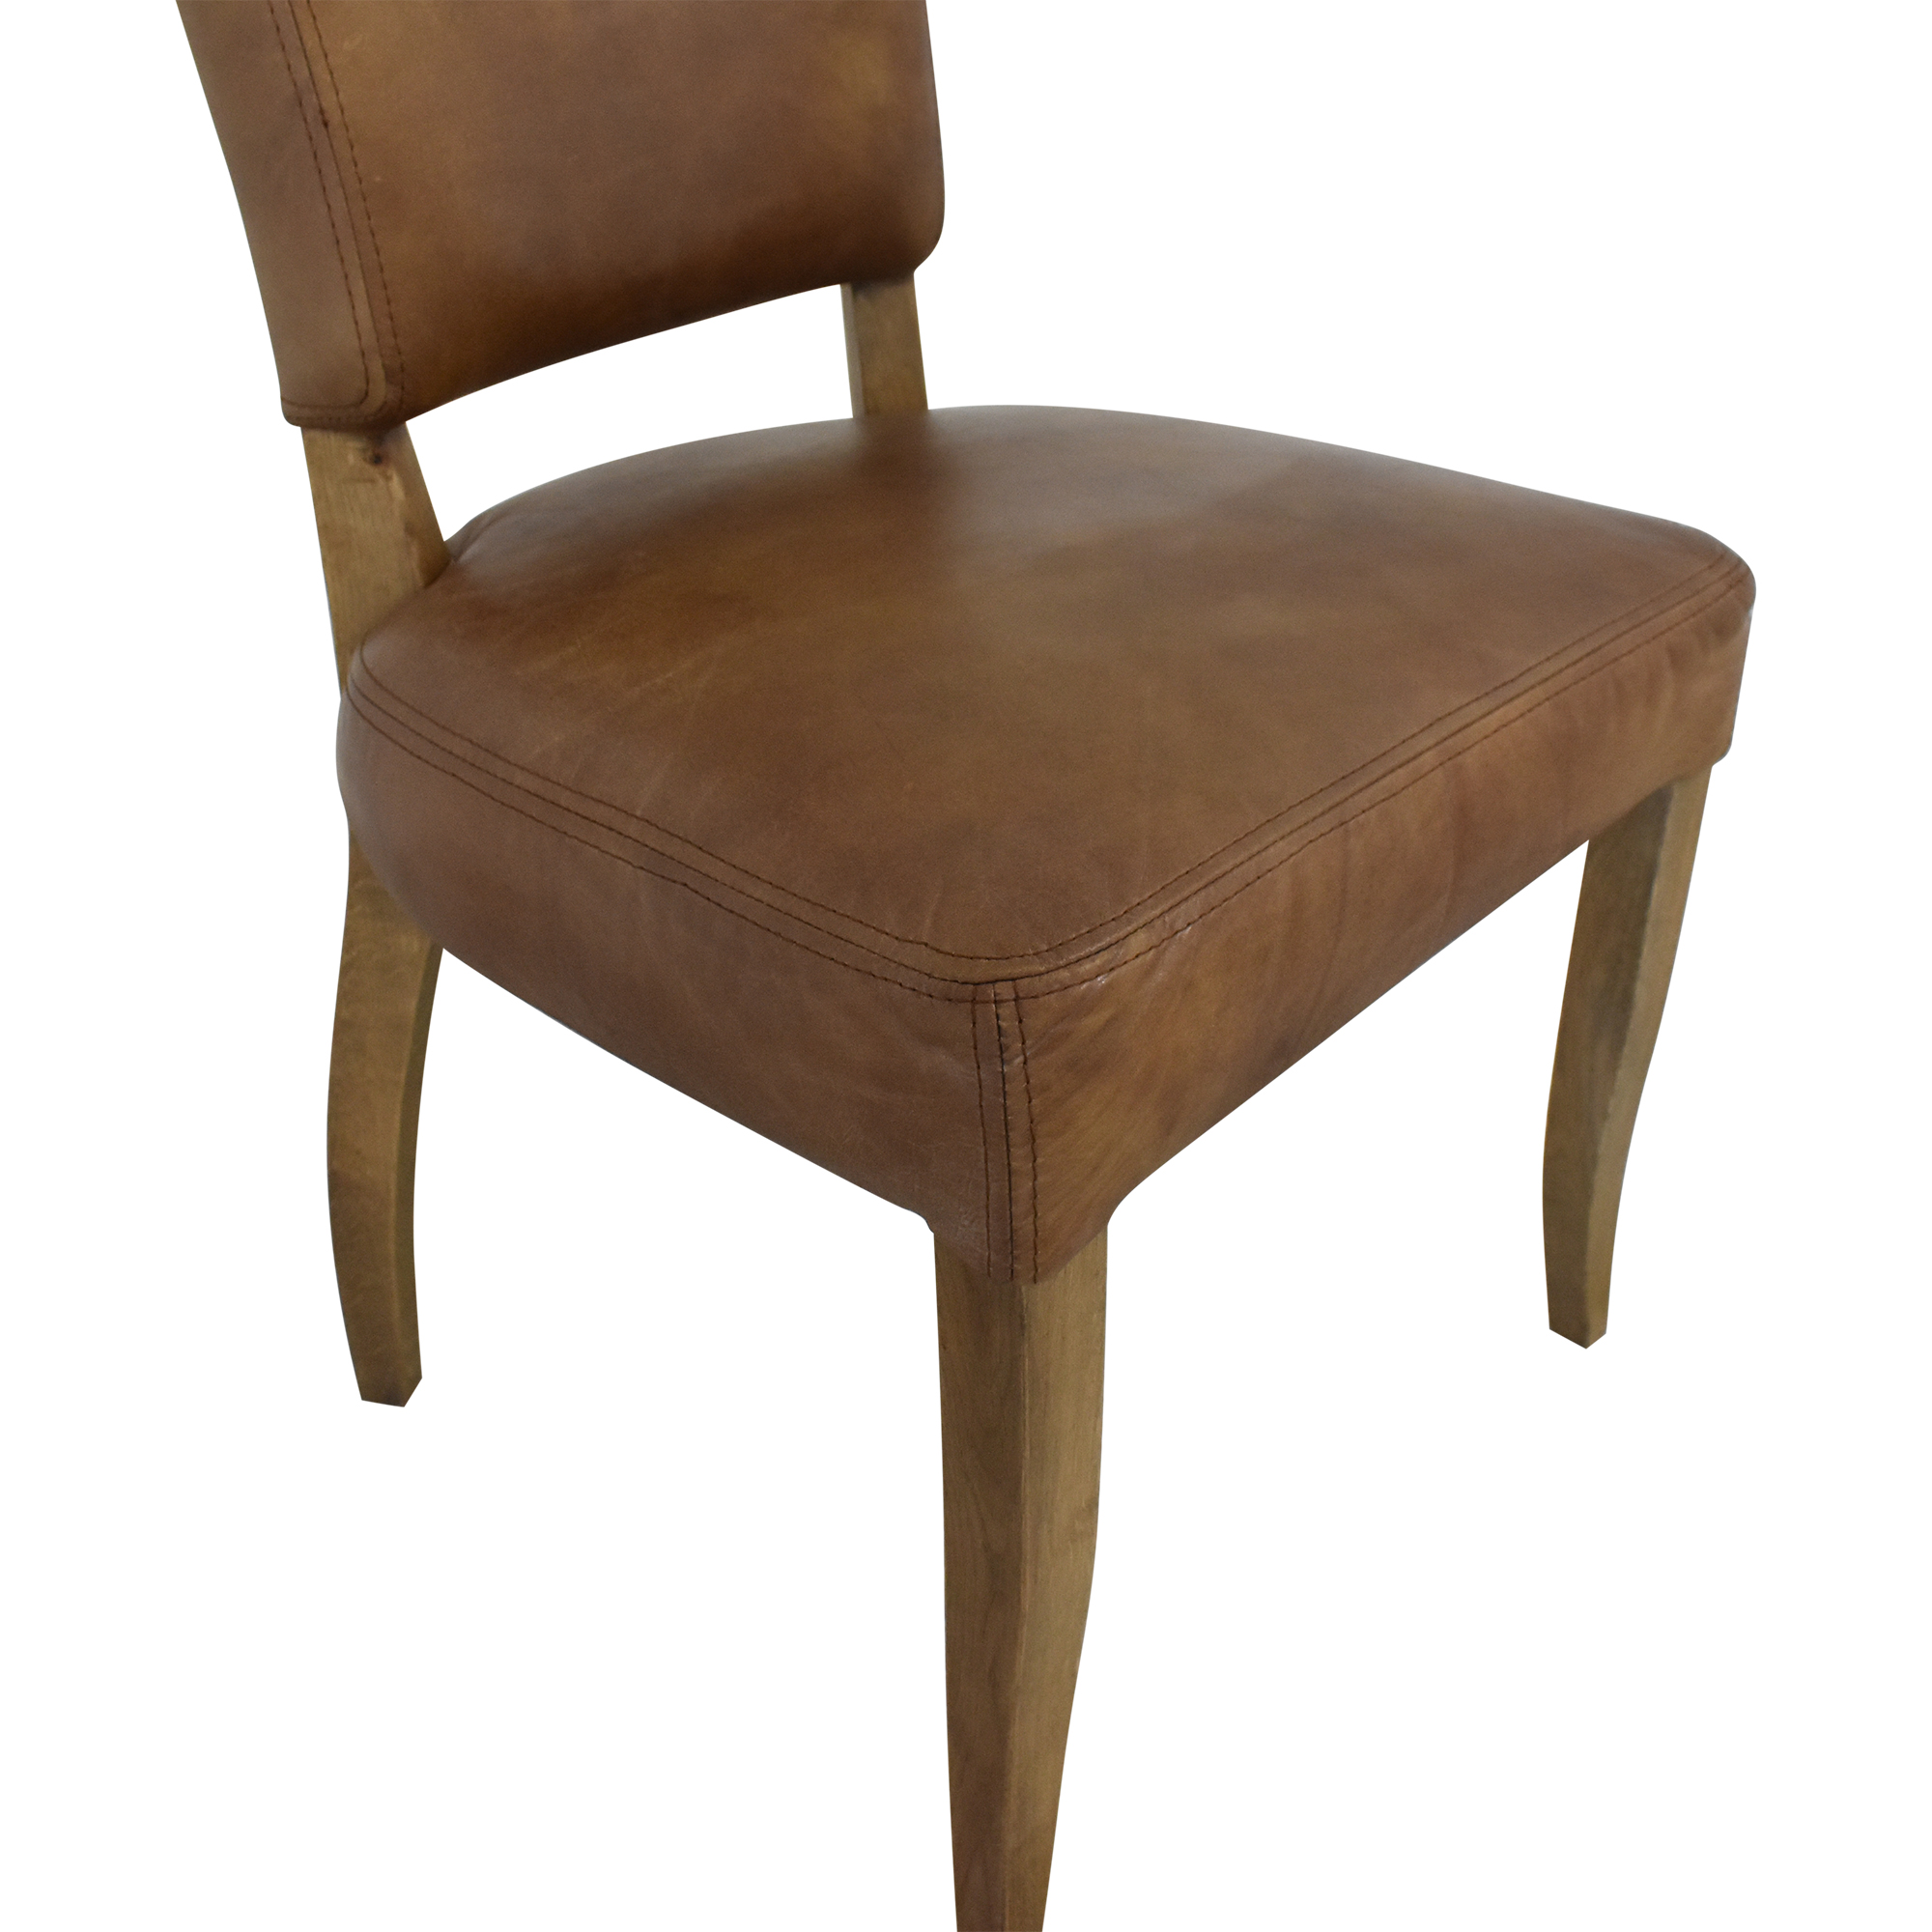 Restoration Hardware Adele Leather Side Chair sale